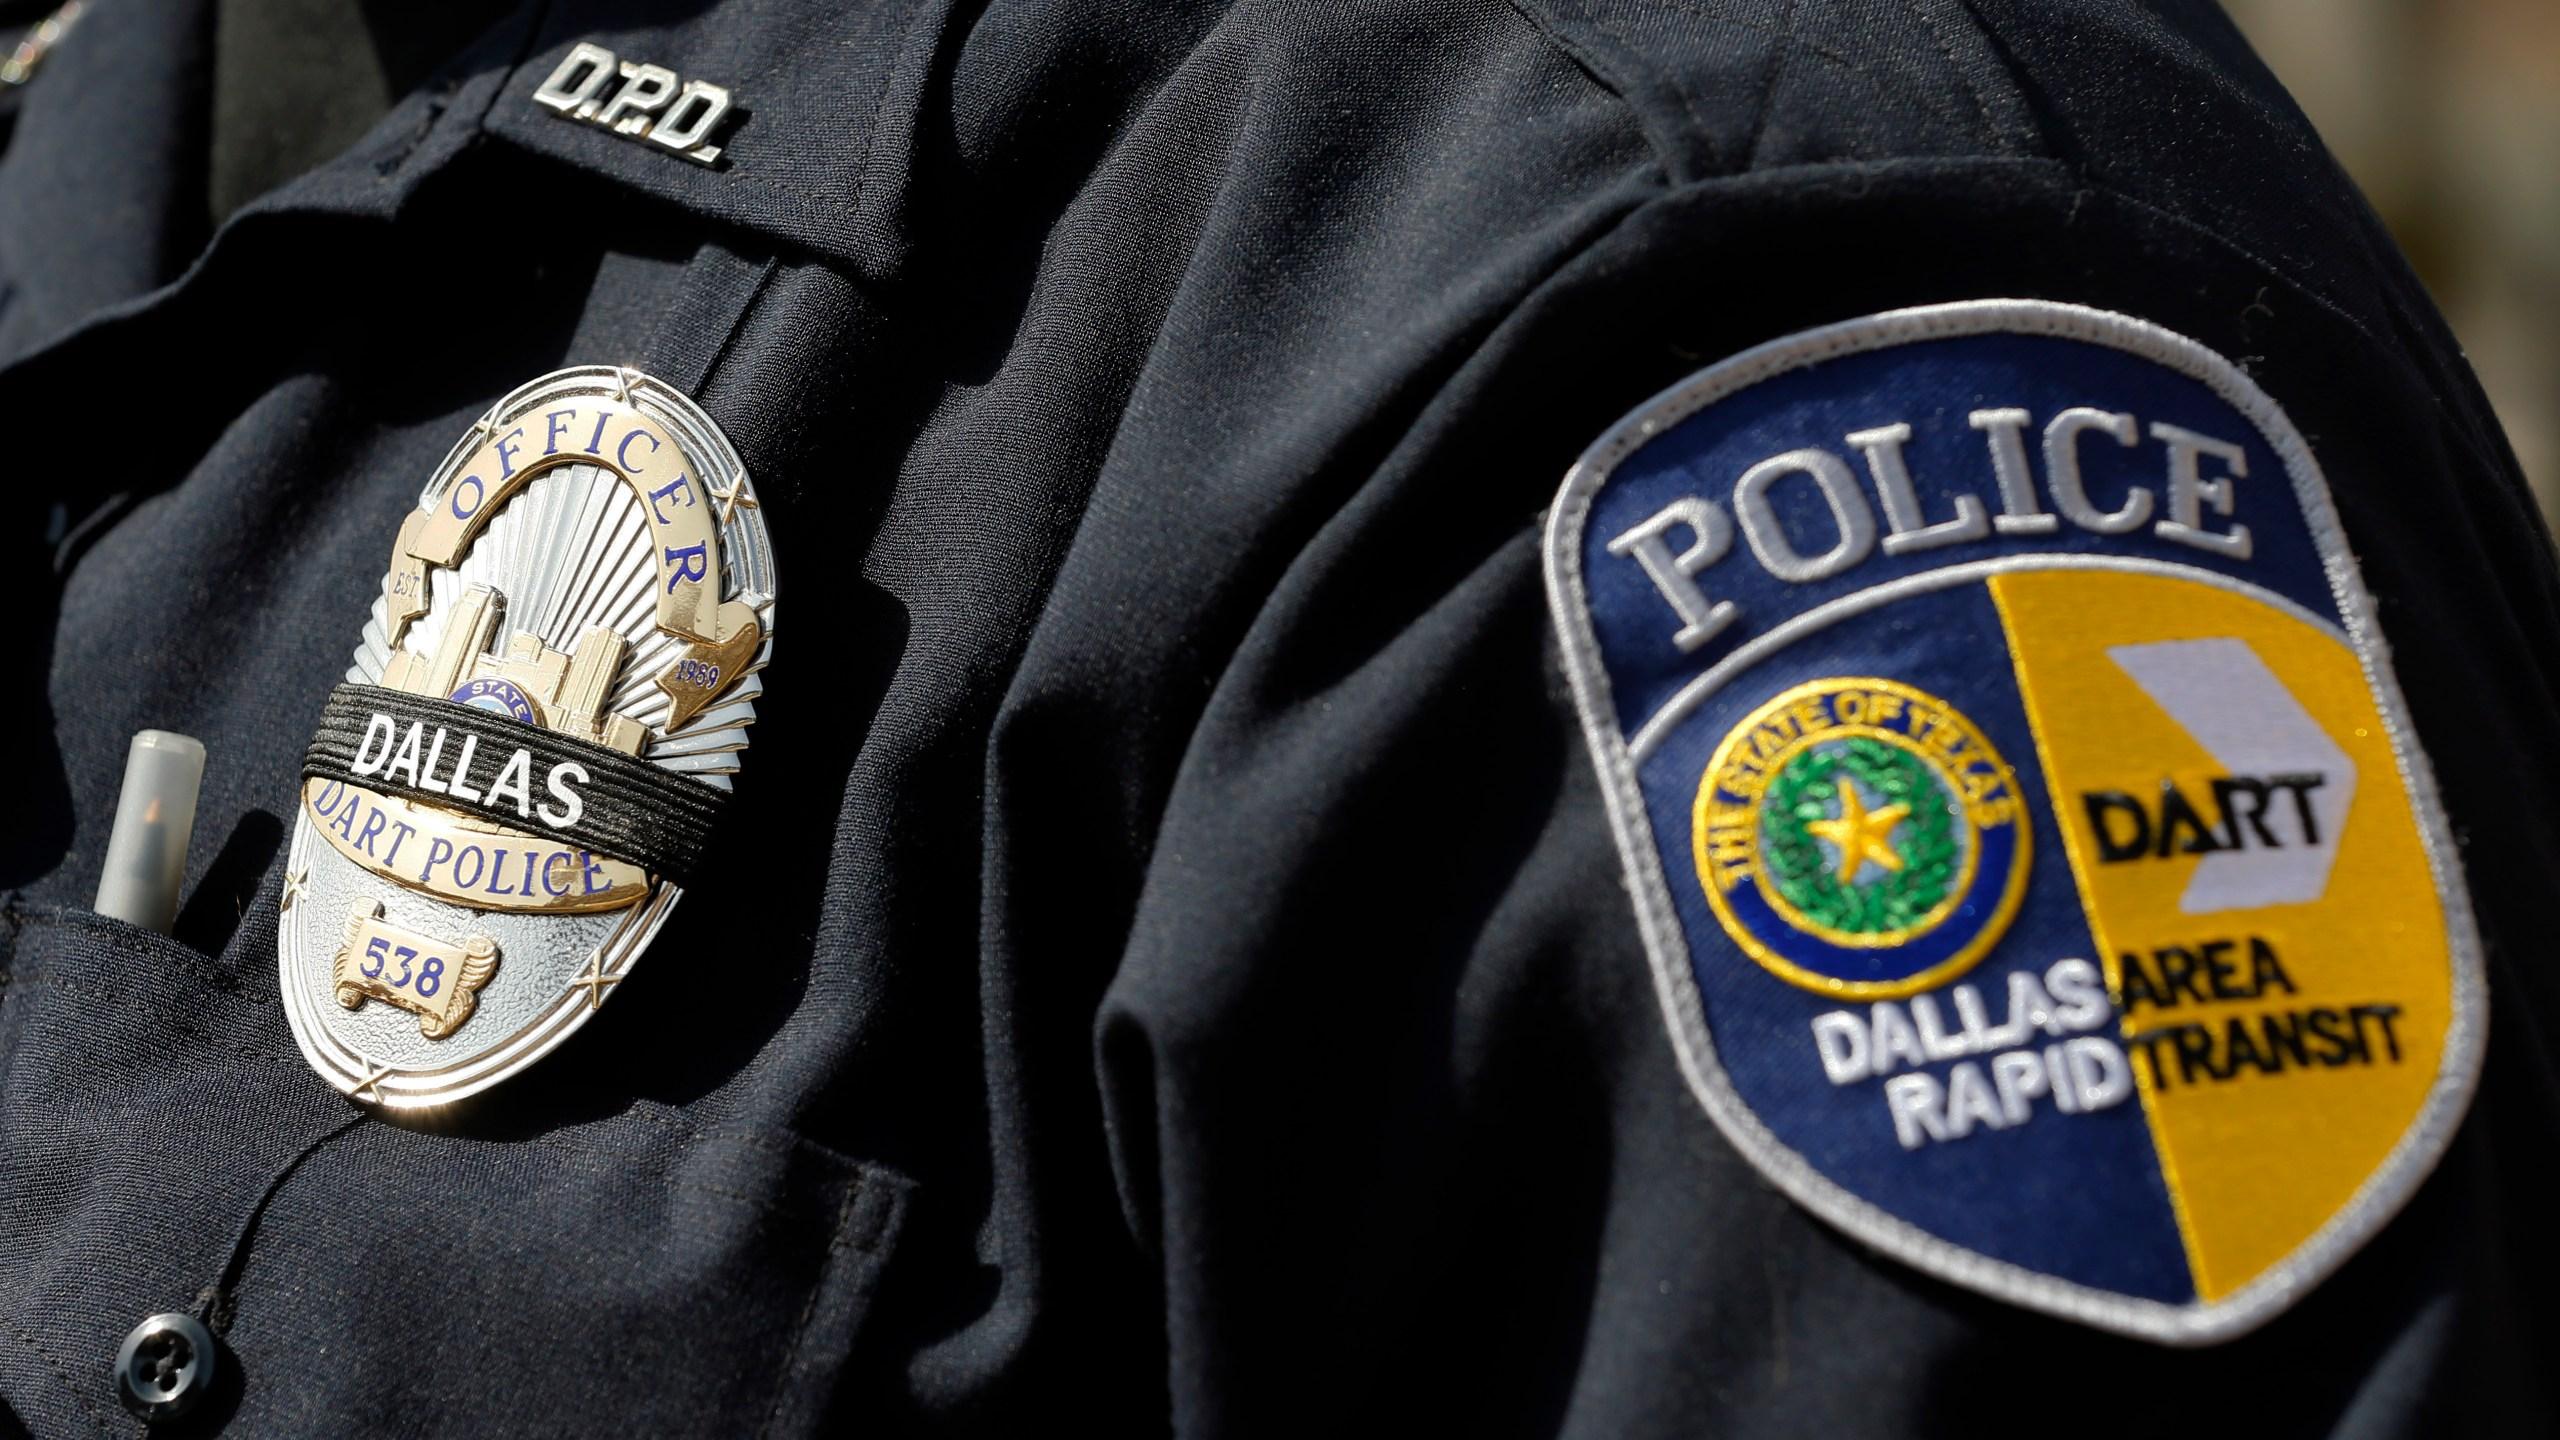 Dallas Police Department | WJTV